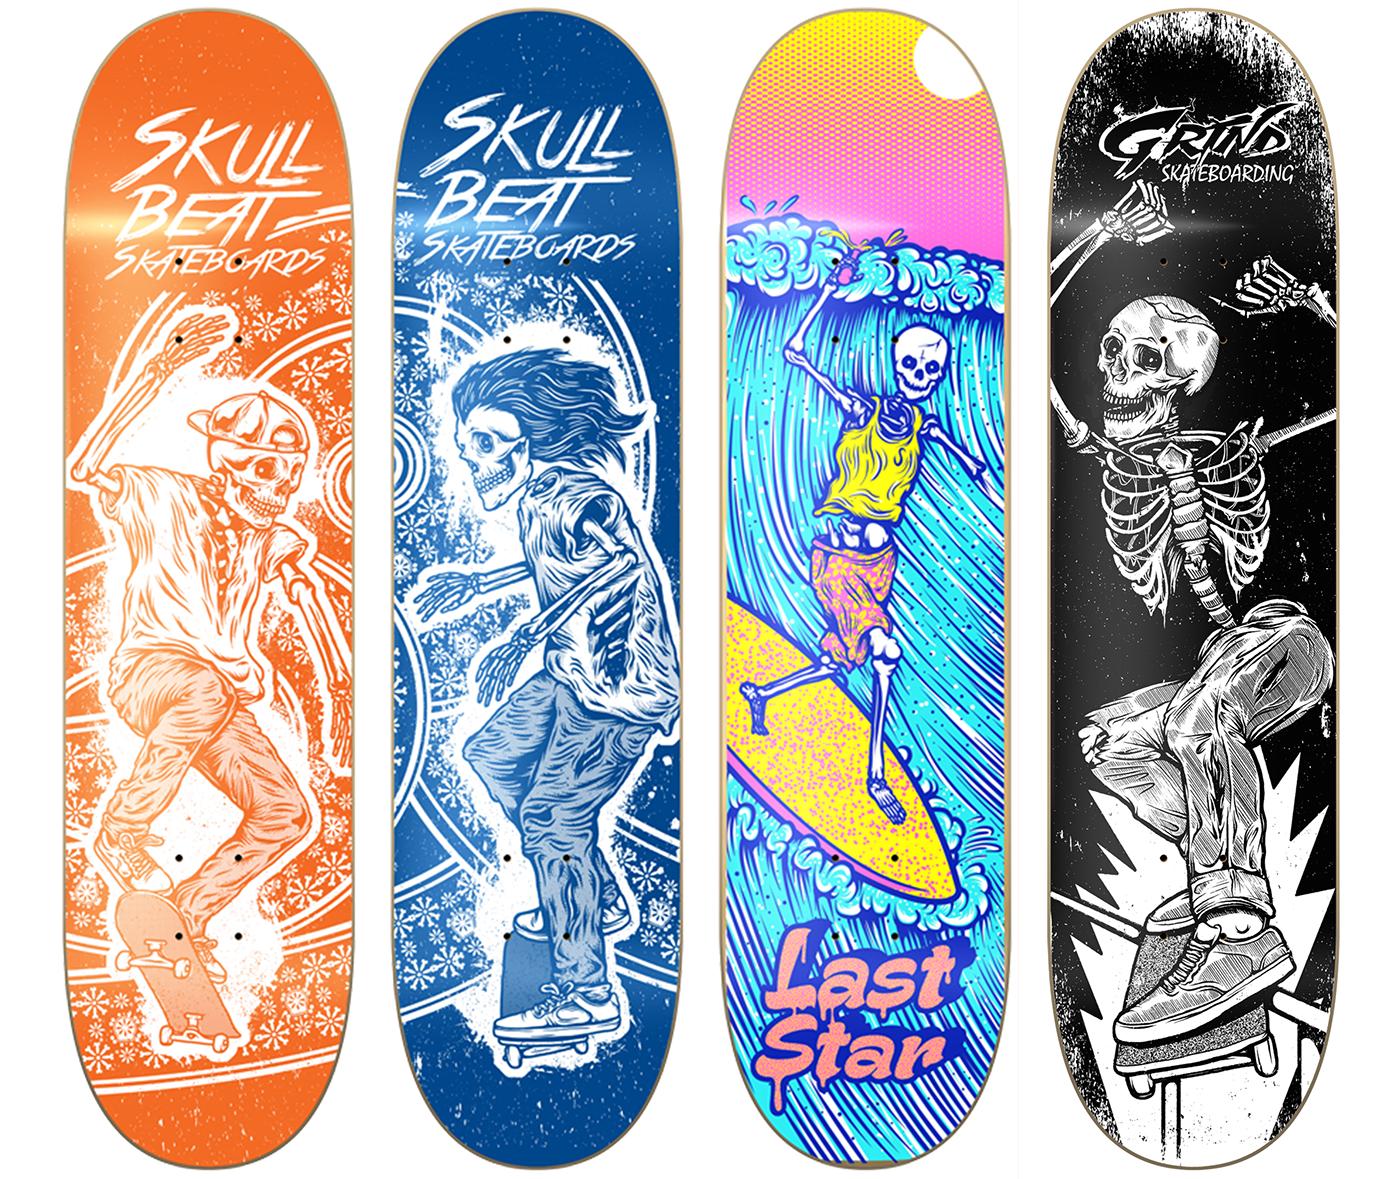 a4afb42dbb87 skulls skates, surf, rock and roll on Behance